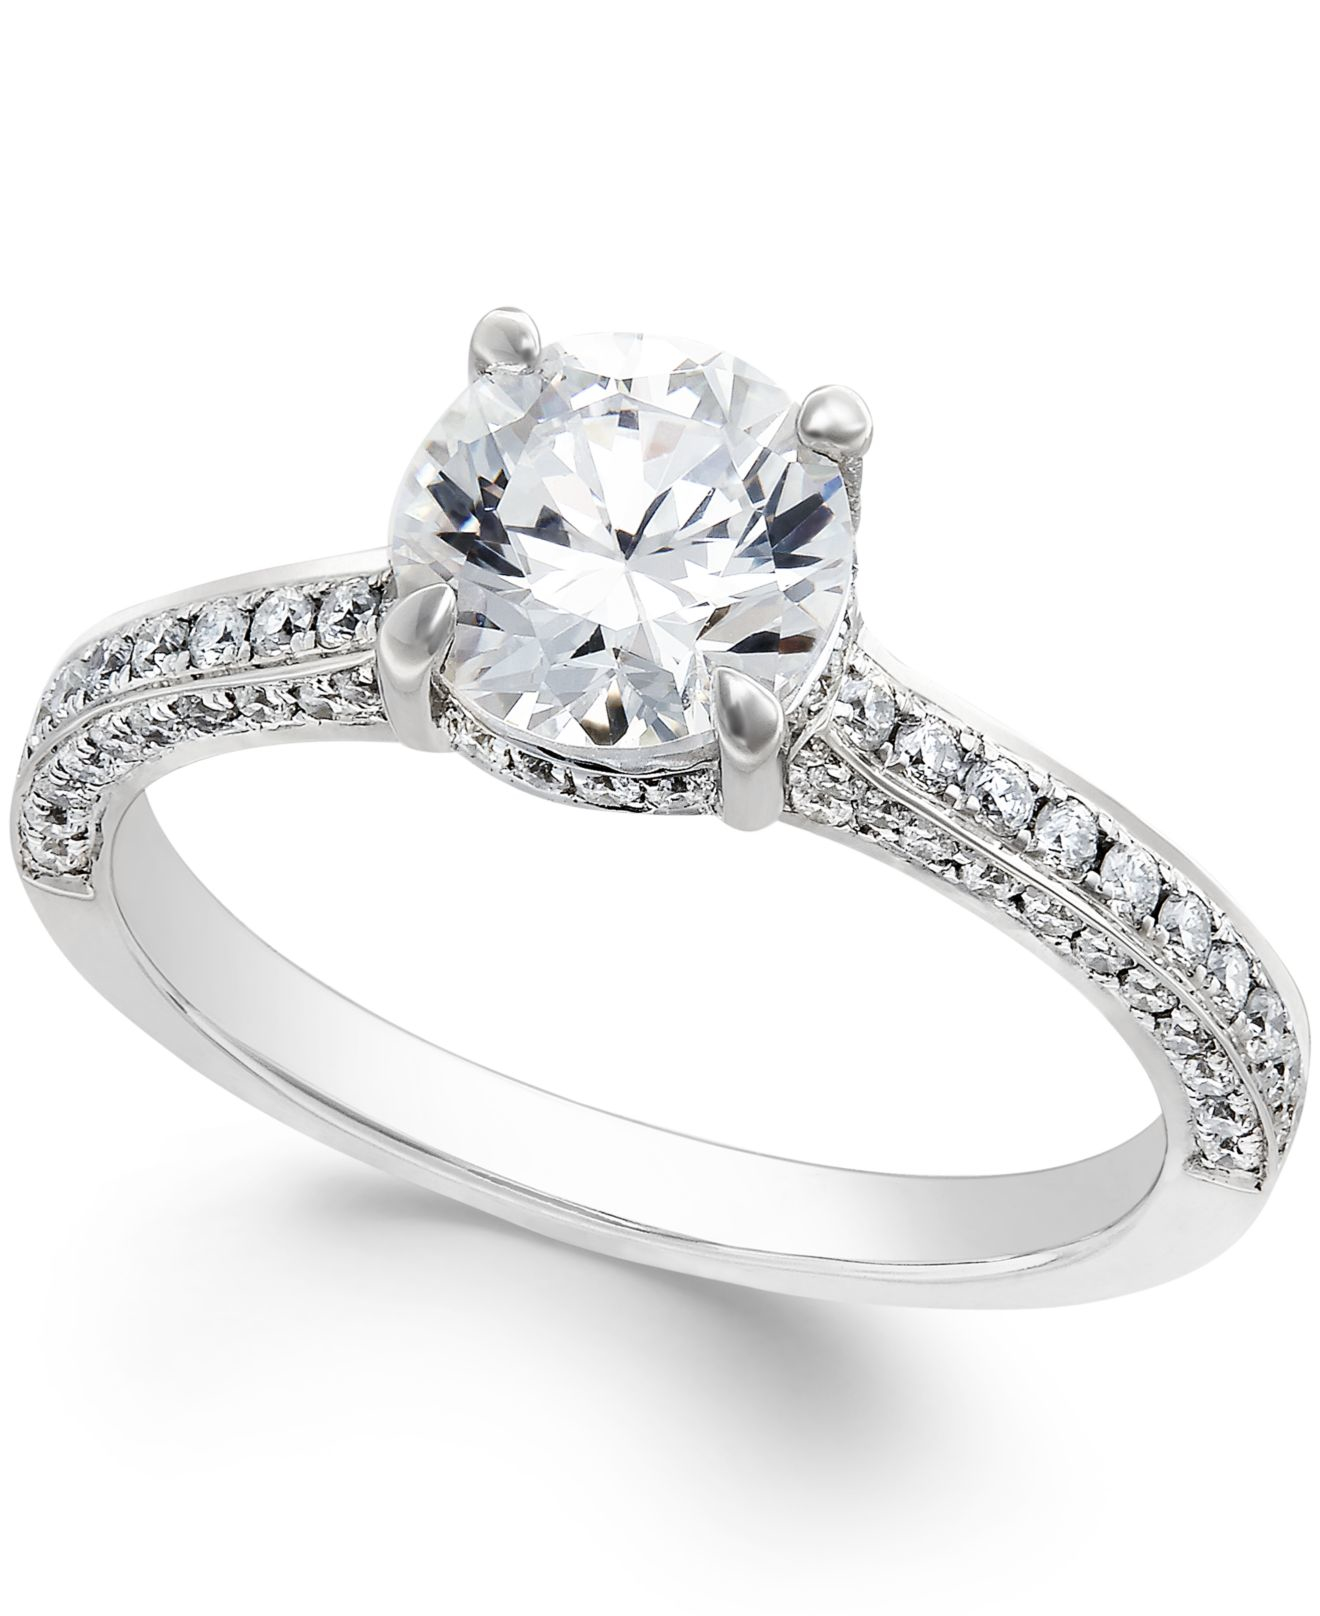 Macy's Certified Diamond Engagement Ring In Platinum (2-1